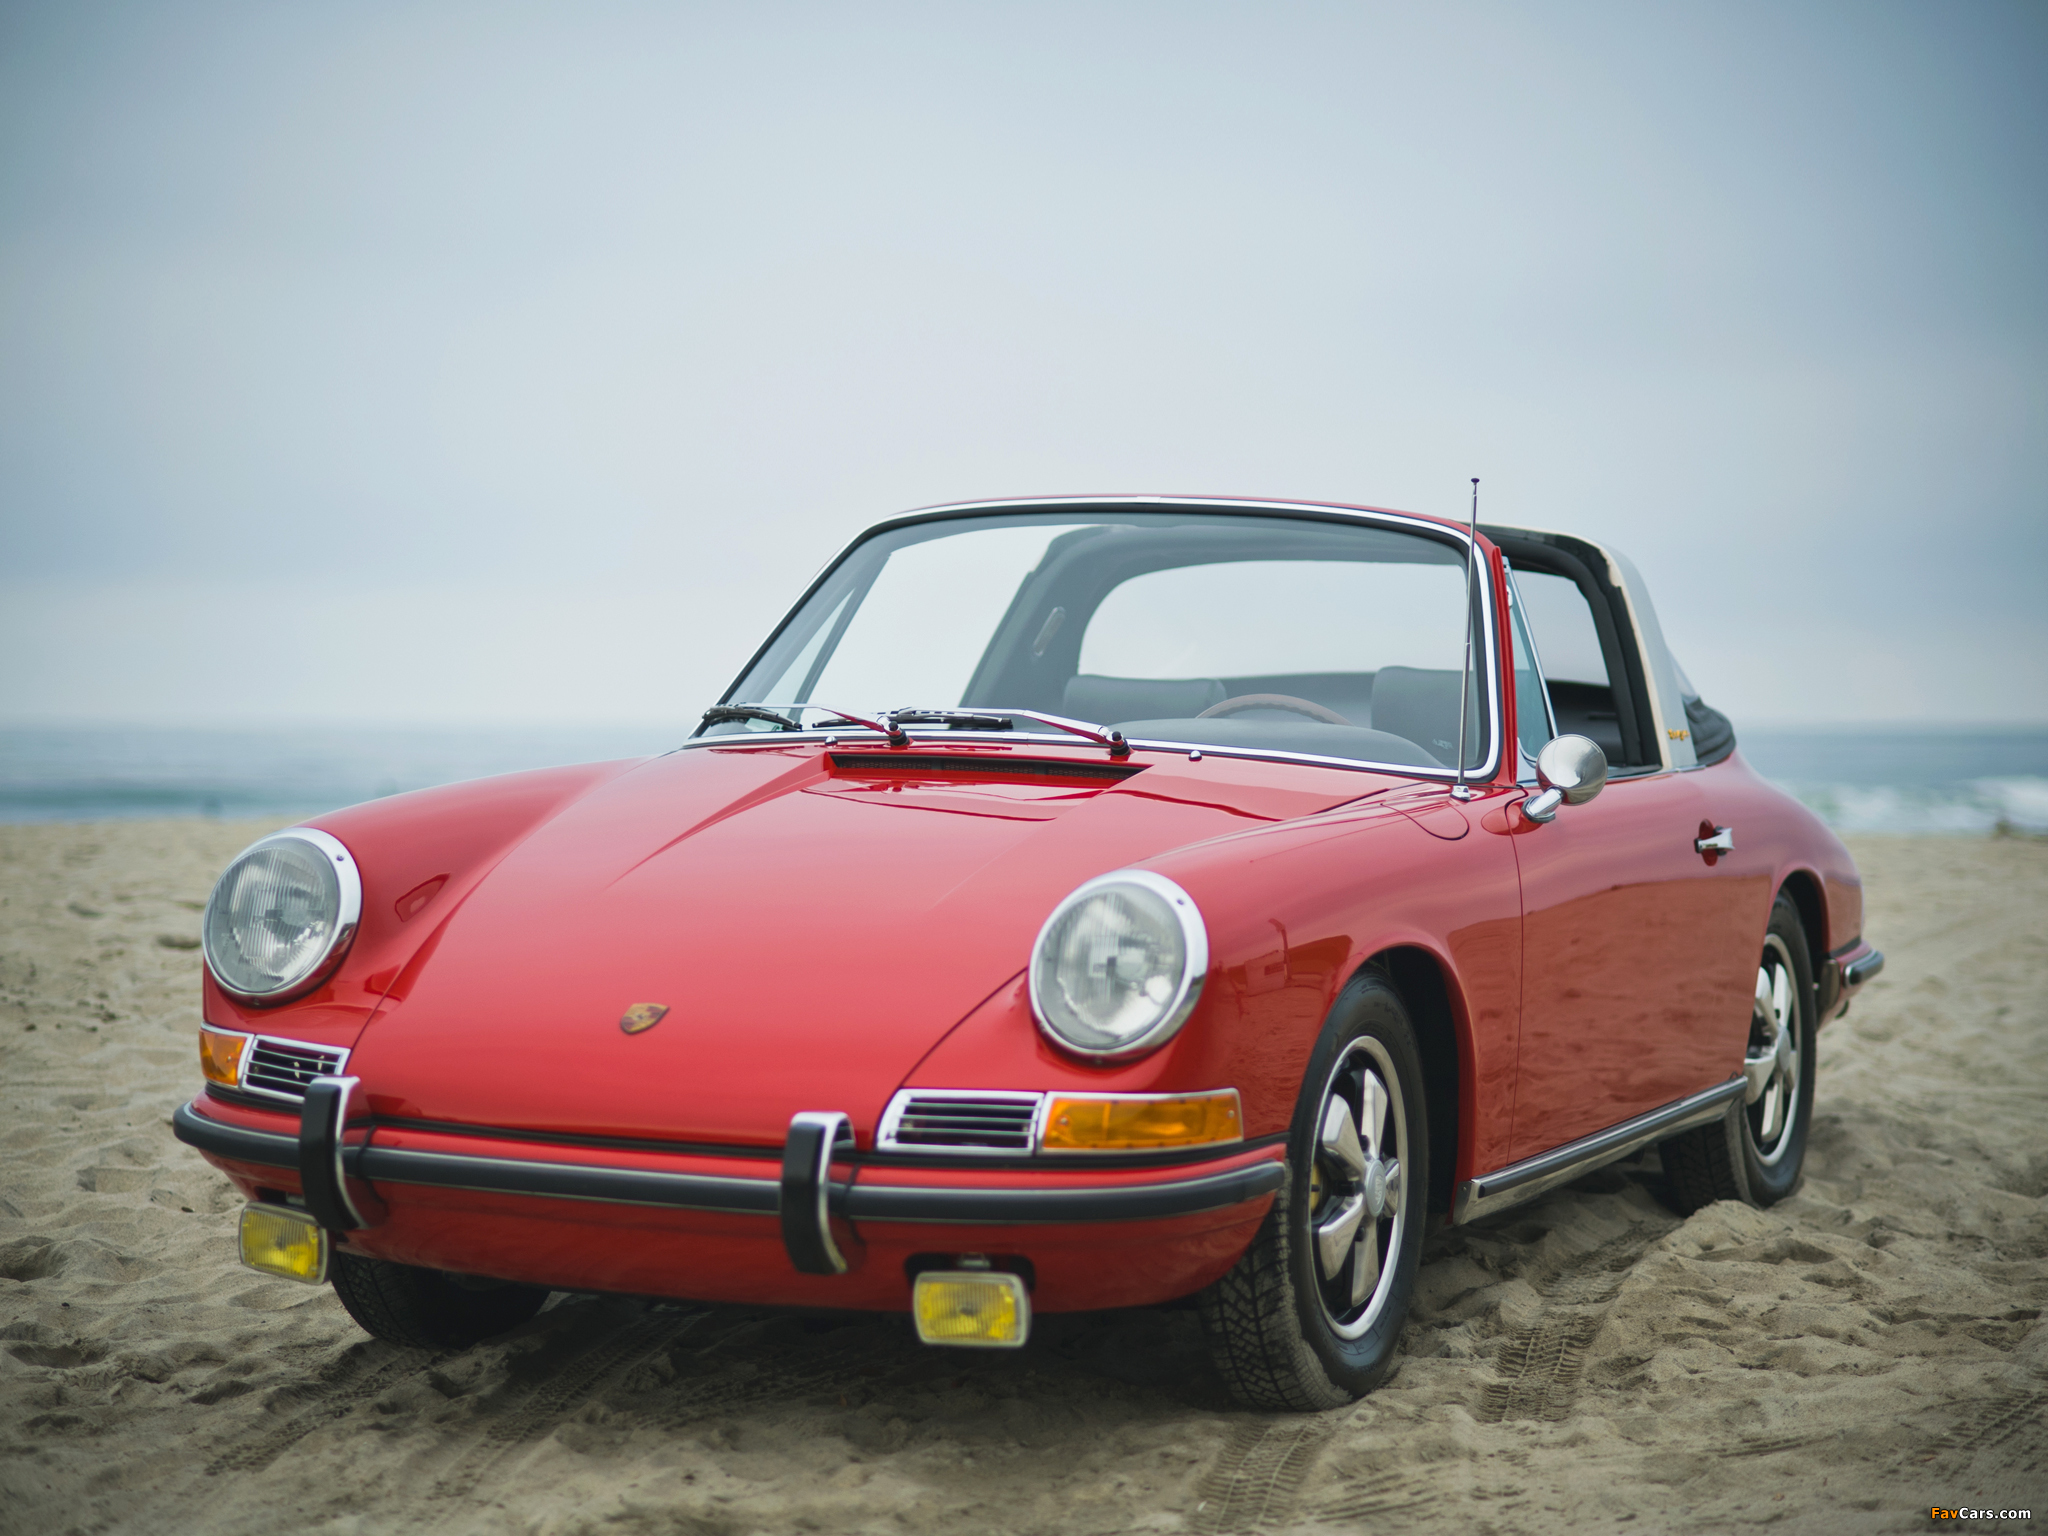 Porsche 911 S 2 0 Targa 901 1966 68 Pictures 2048x1536